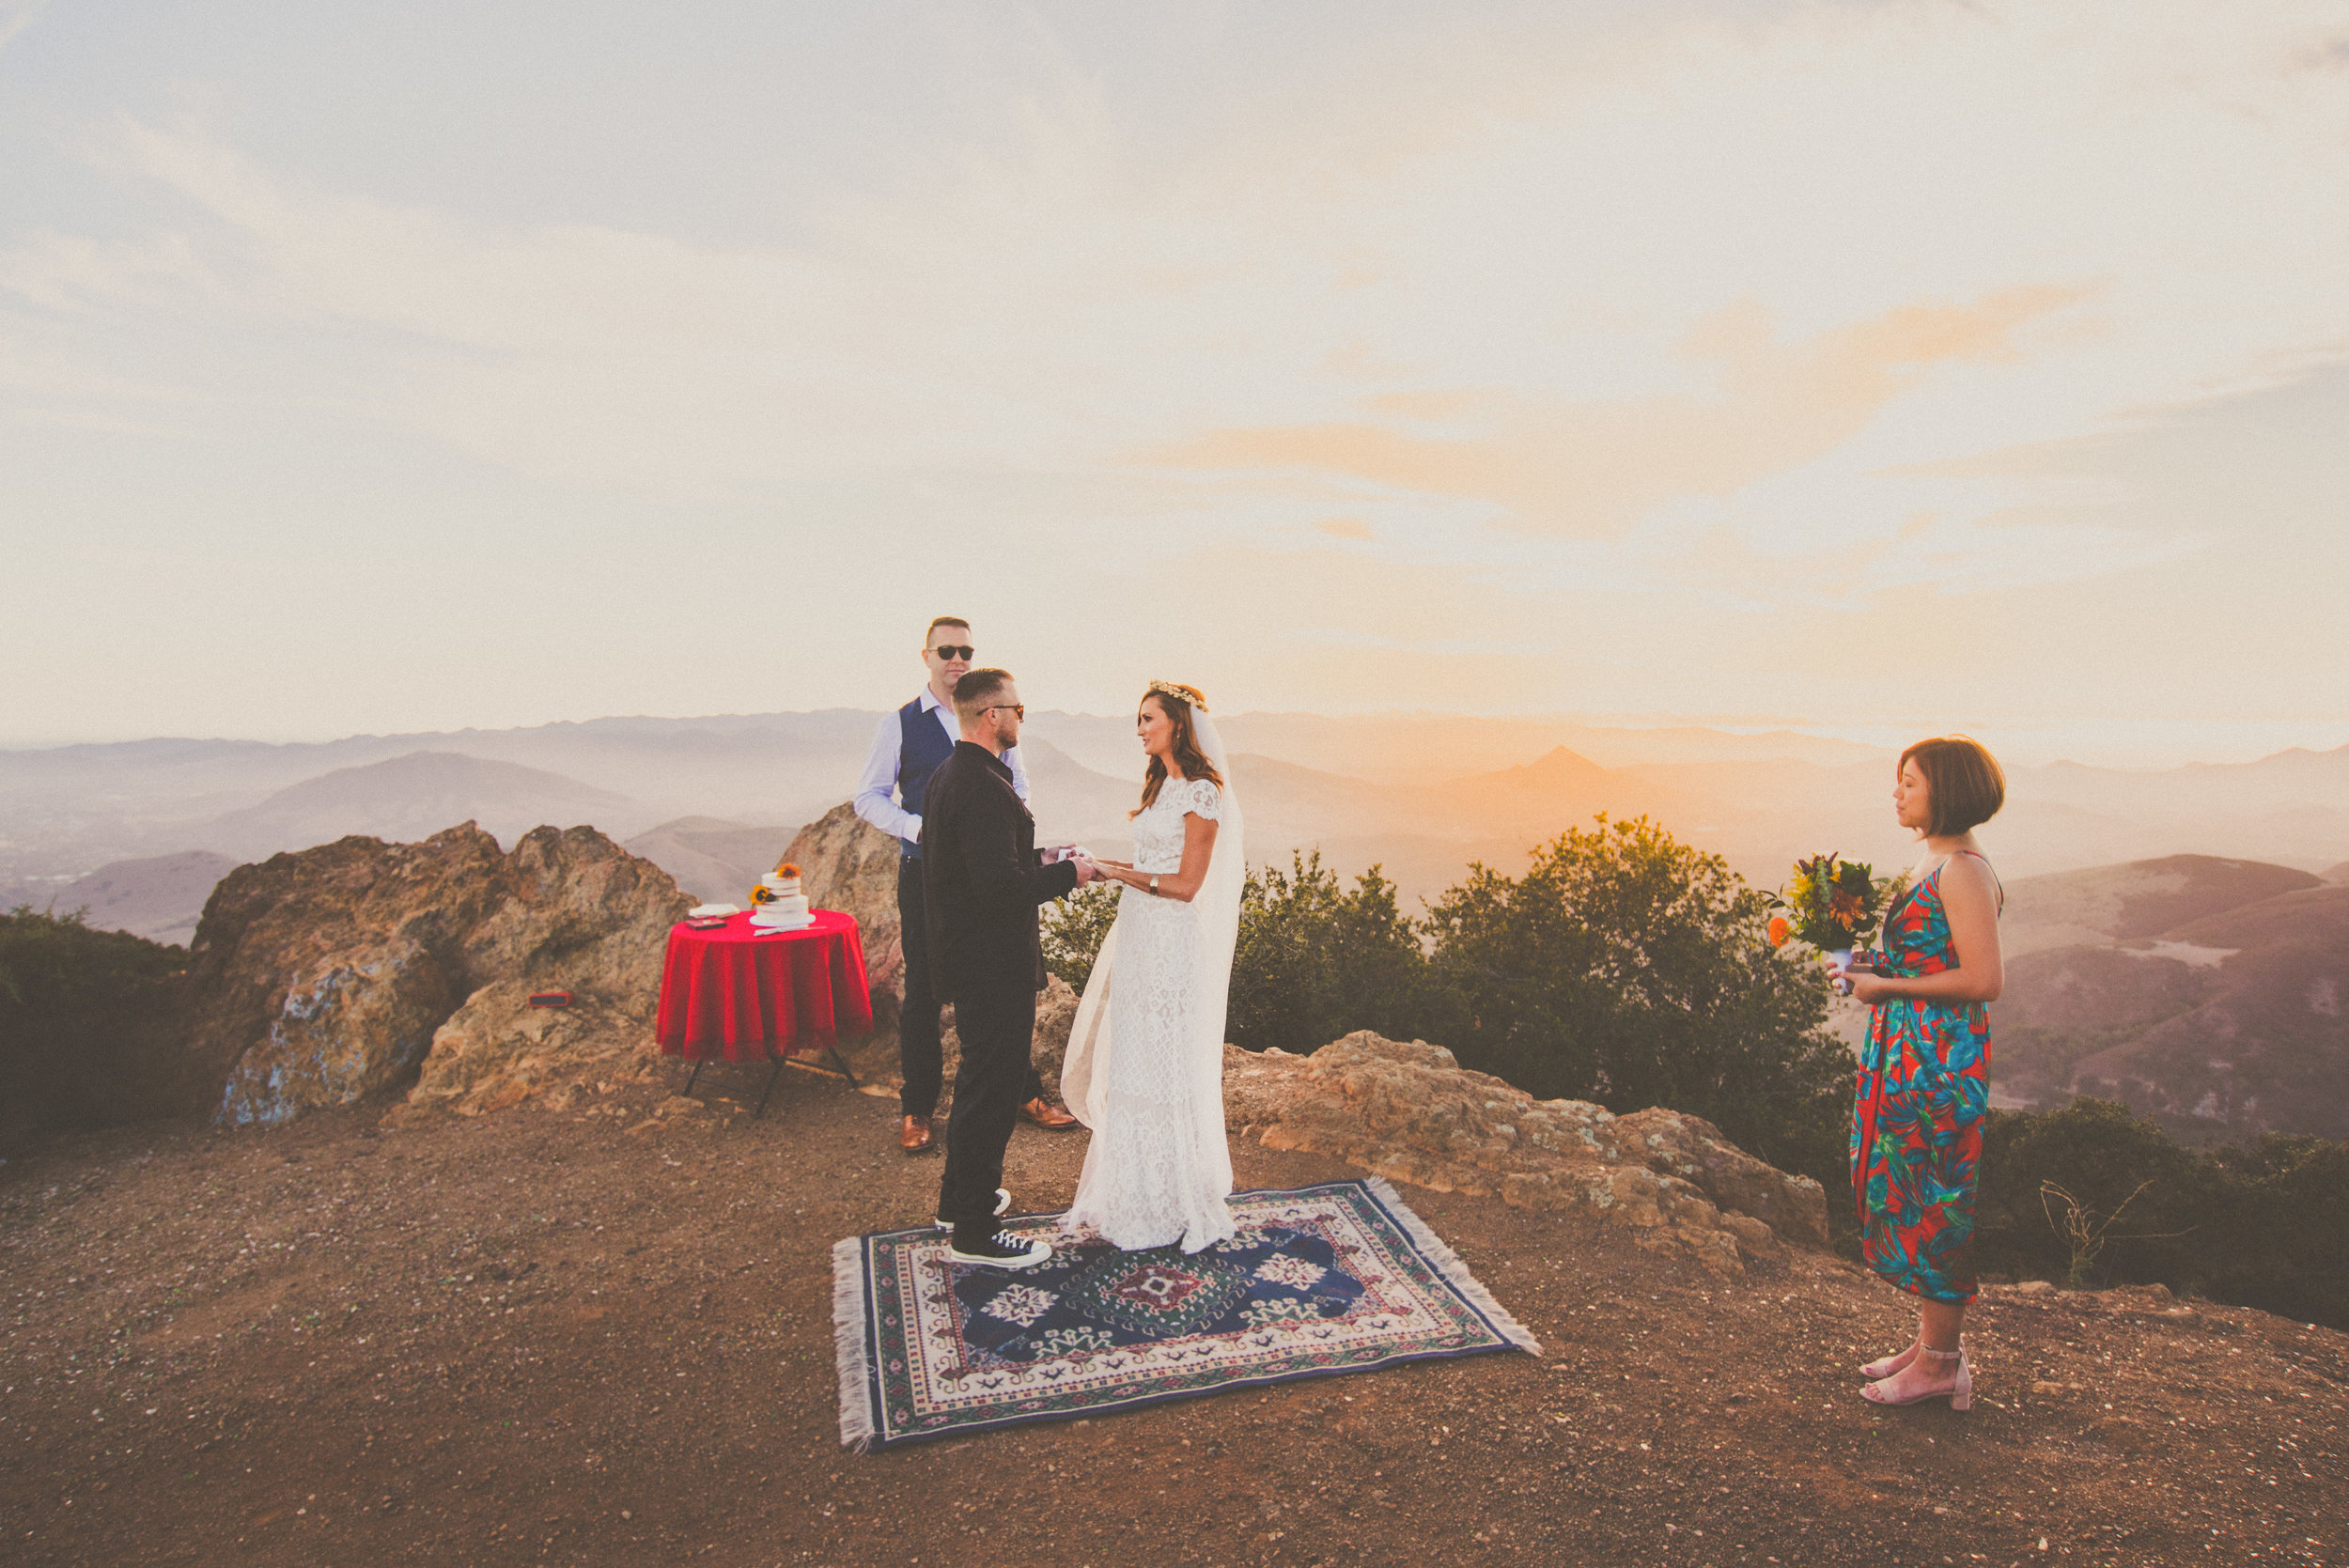 Megan & Luke - Ceremony-21.jpg